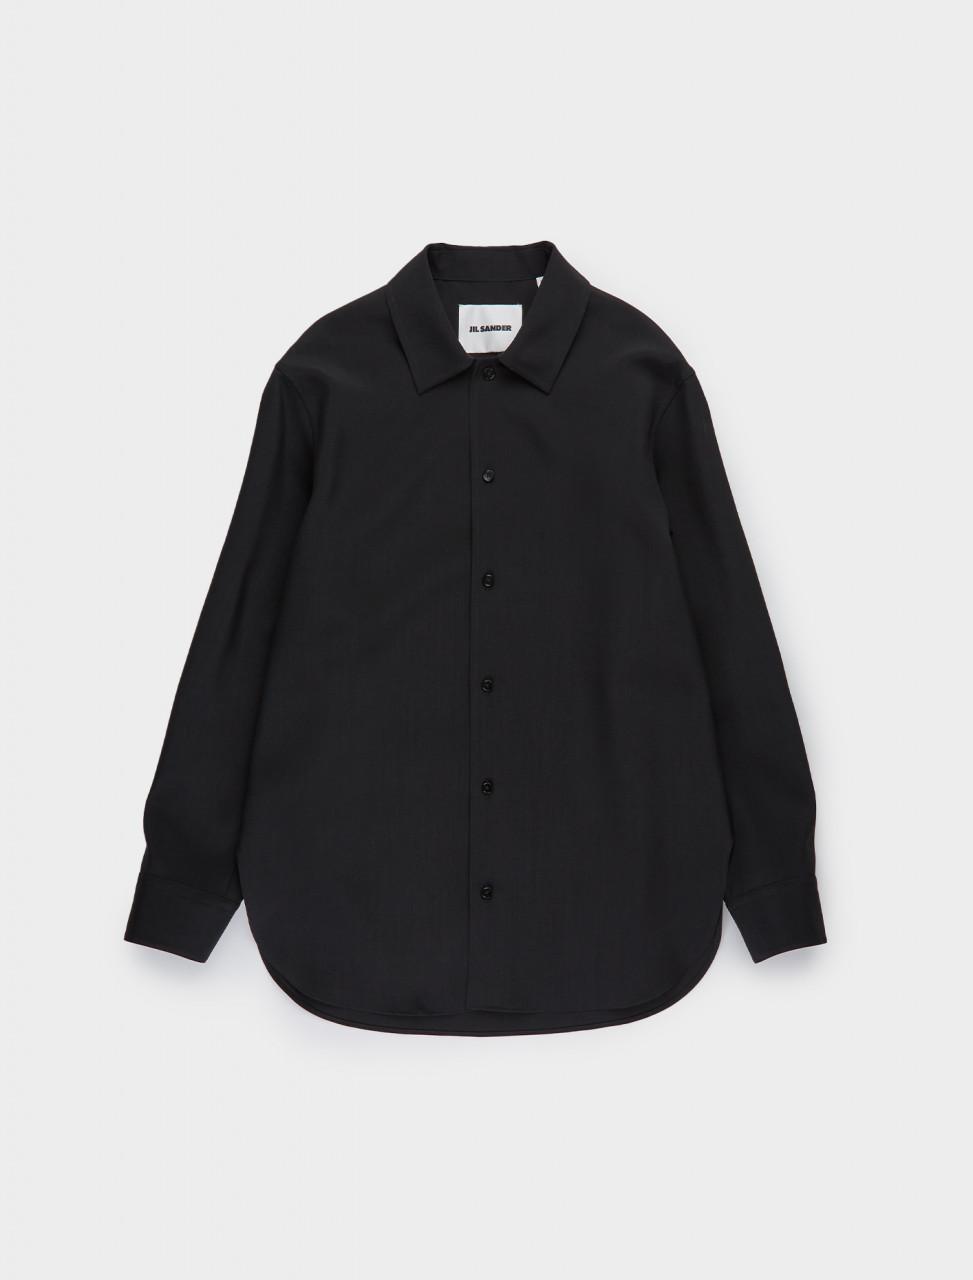 130-JSMR742226-MR203400-001 JIL SANDER Wool Shirt in Black